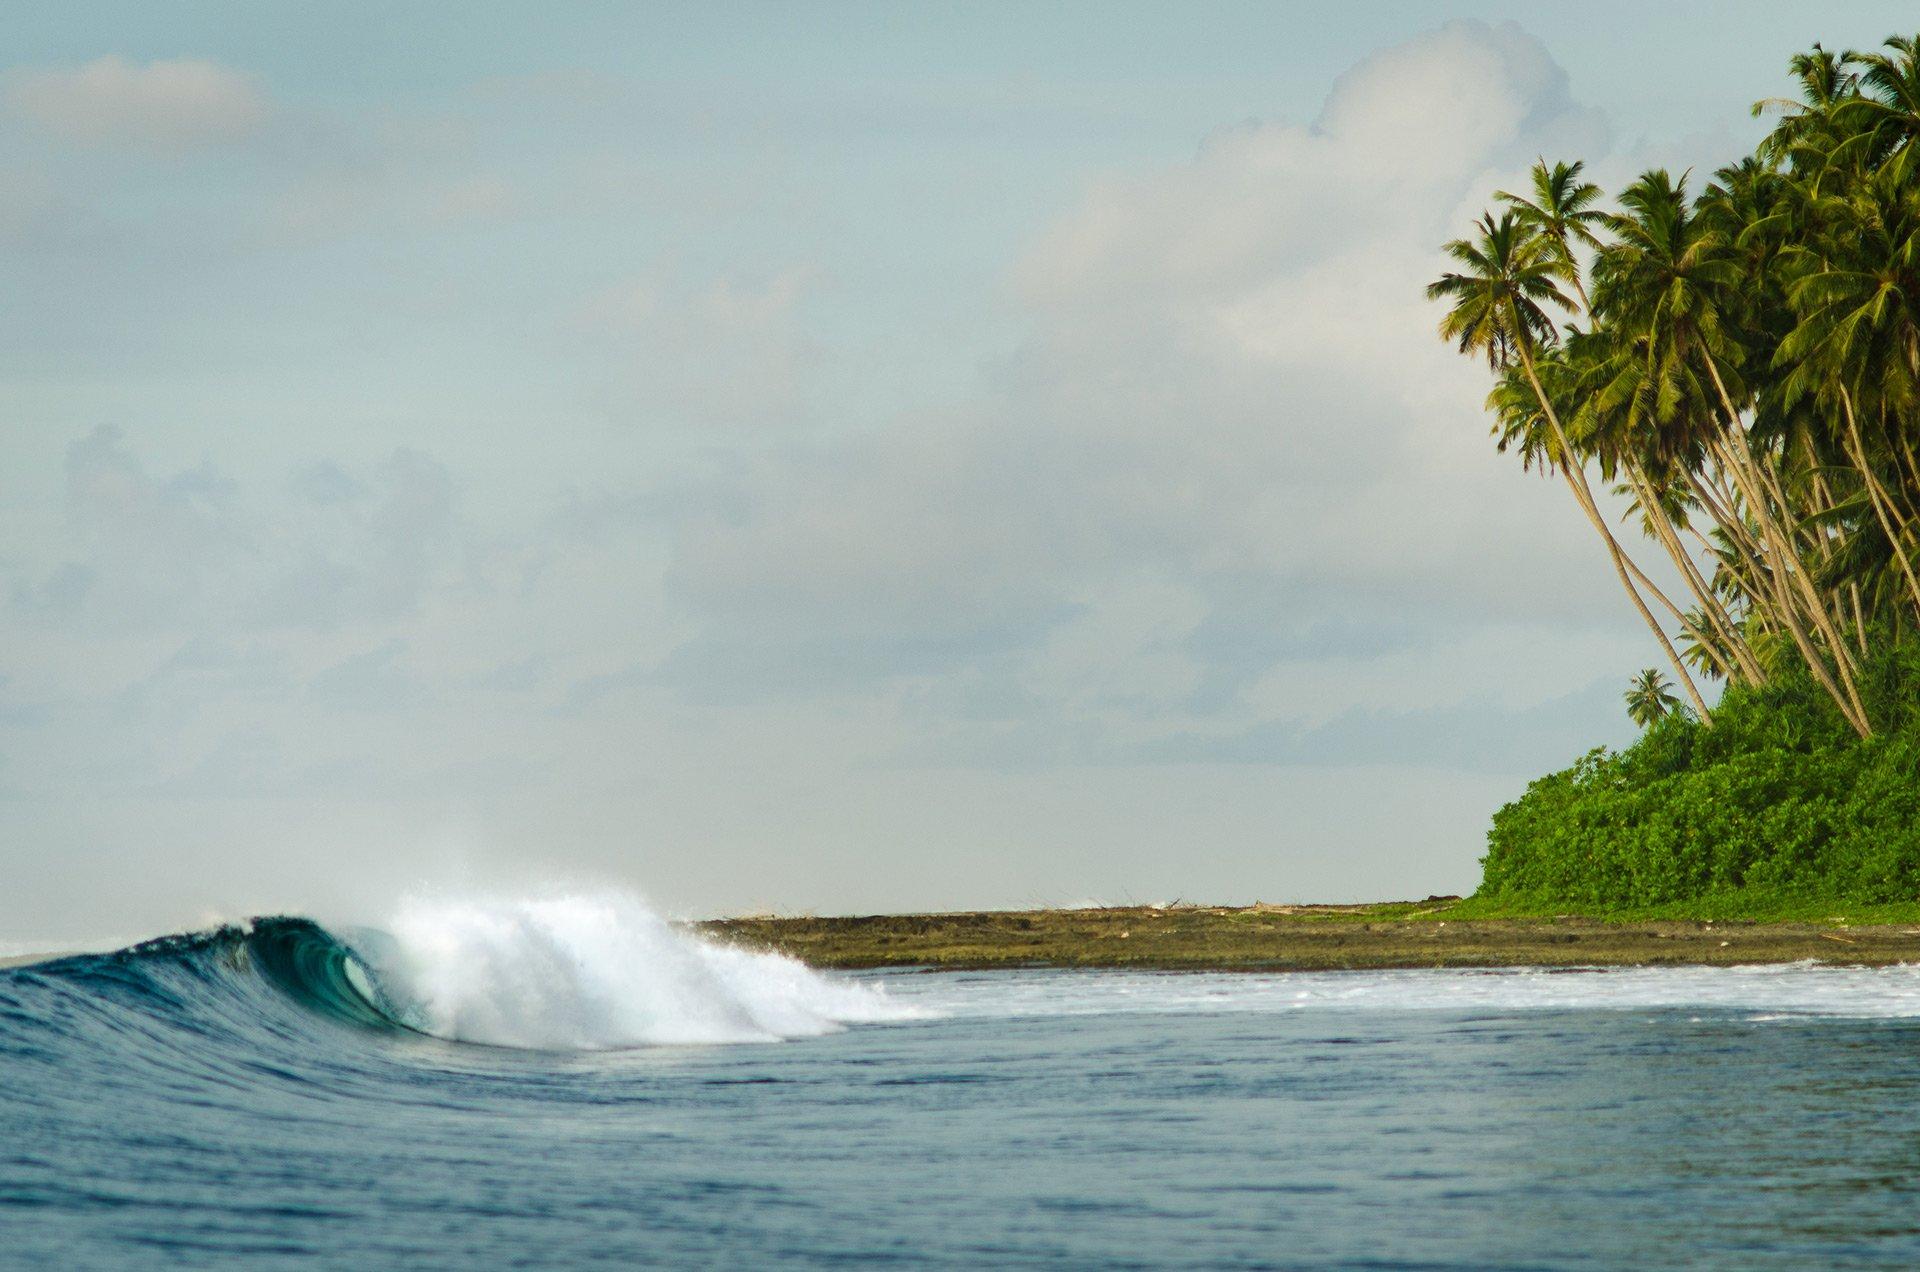 Surfing Simeulue surfspots: Tea-Bags